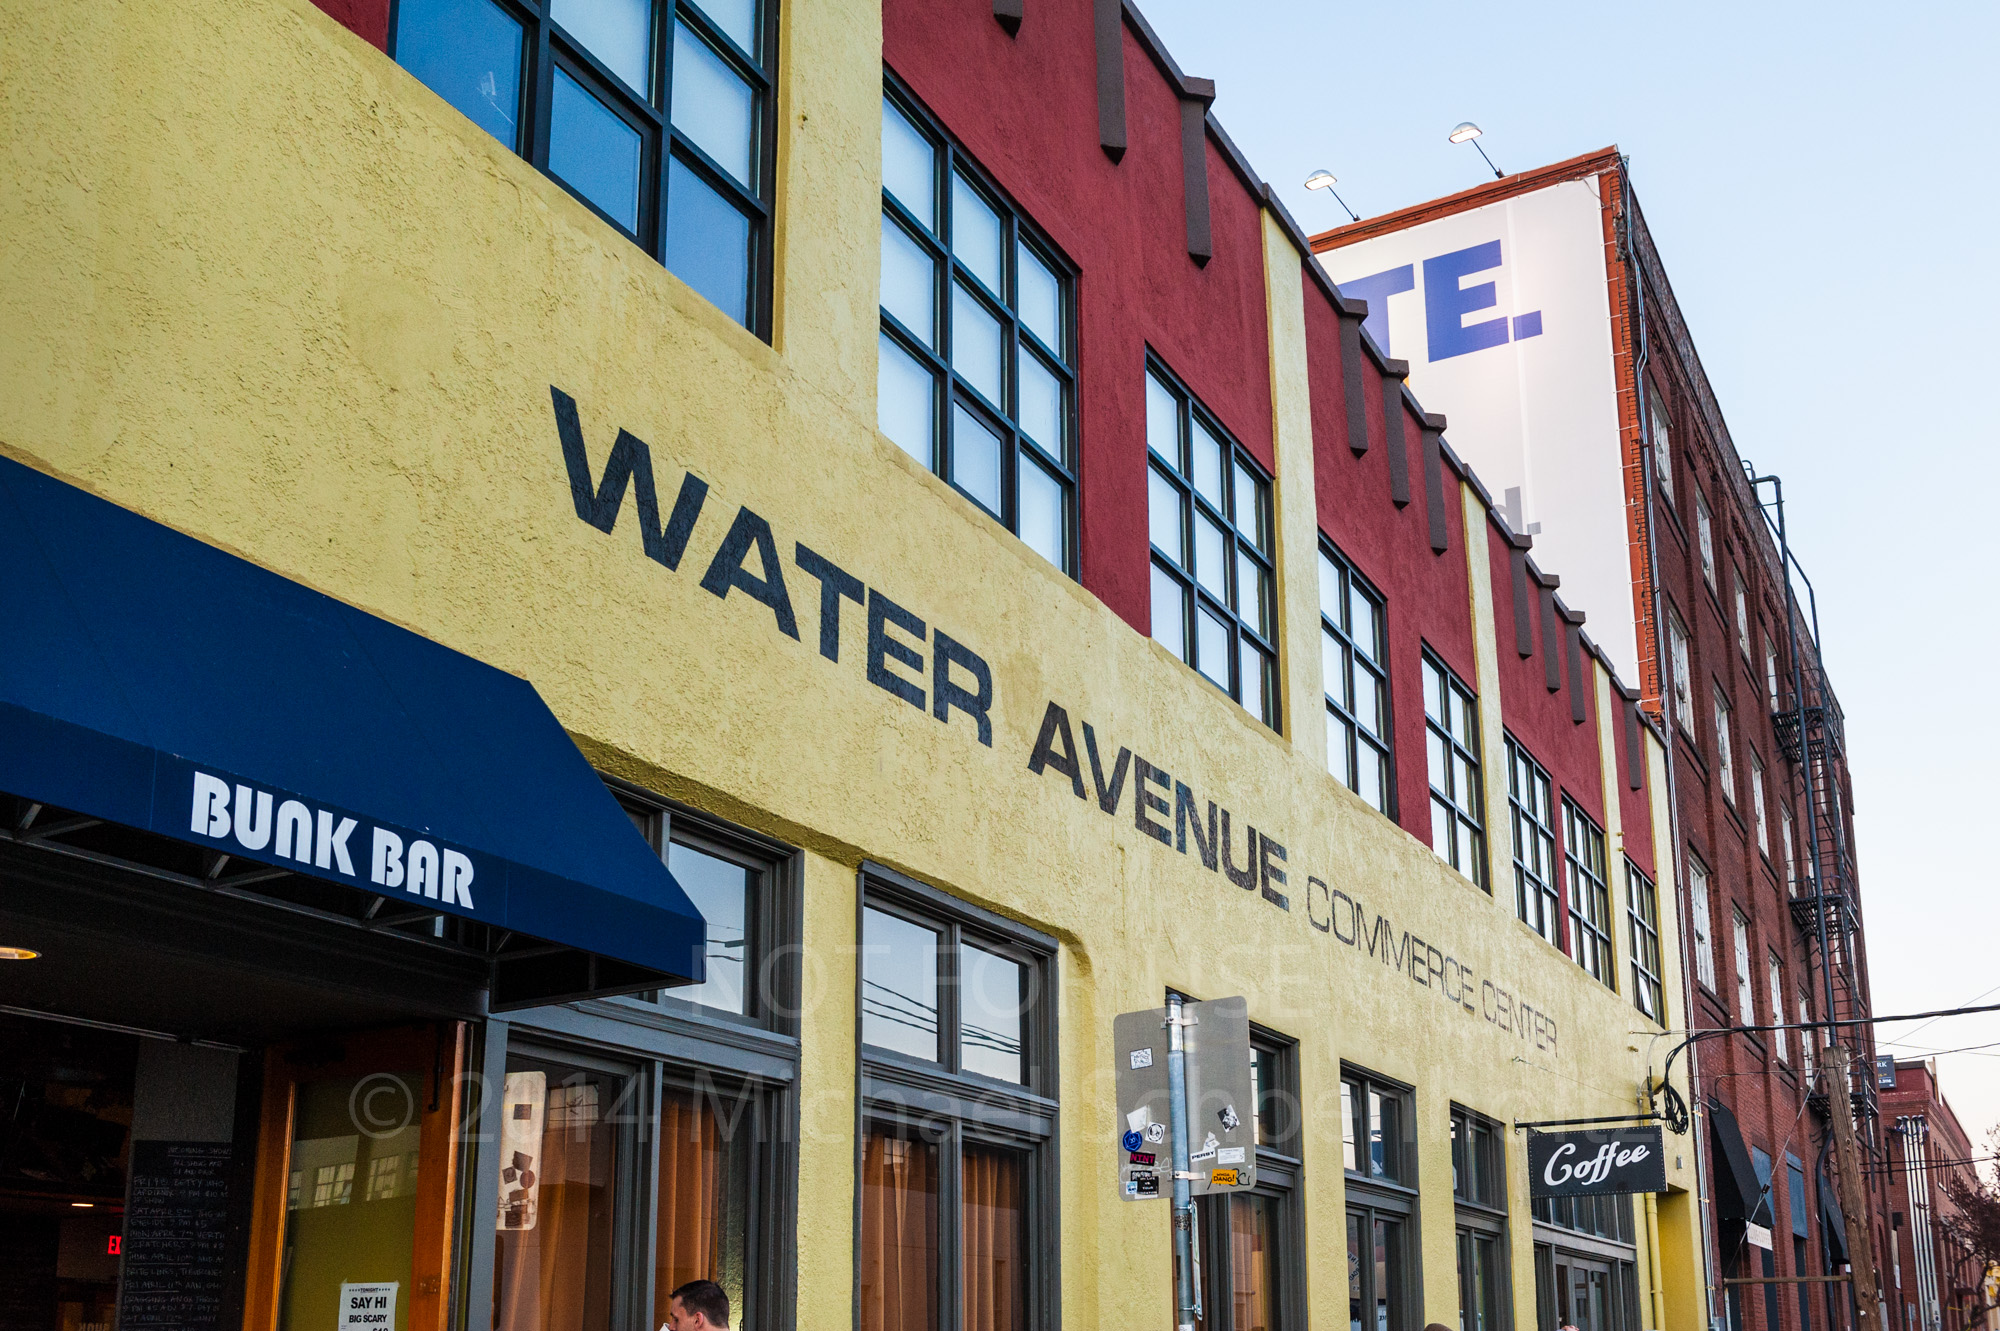 Water Ave-4167.jpg